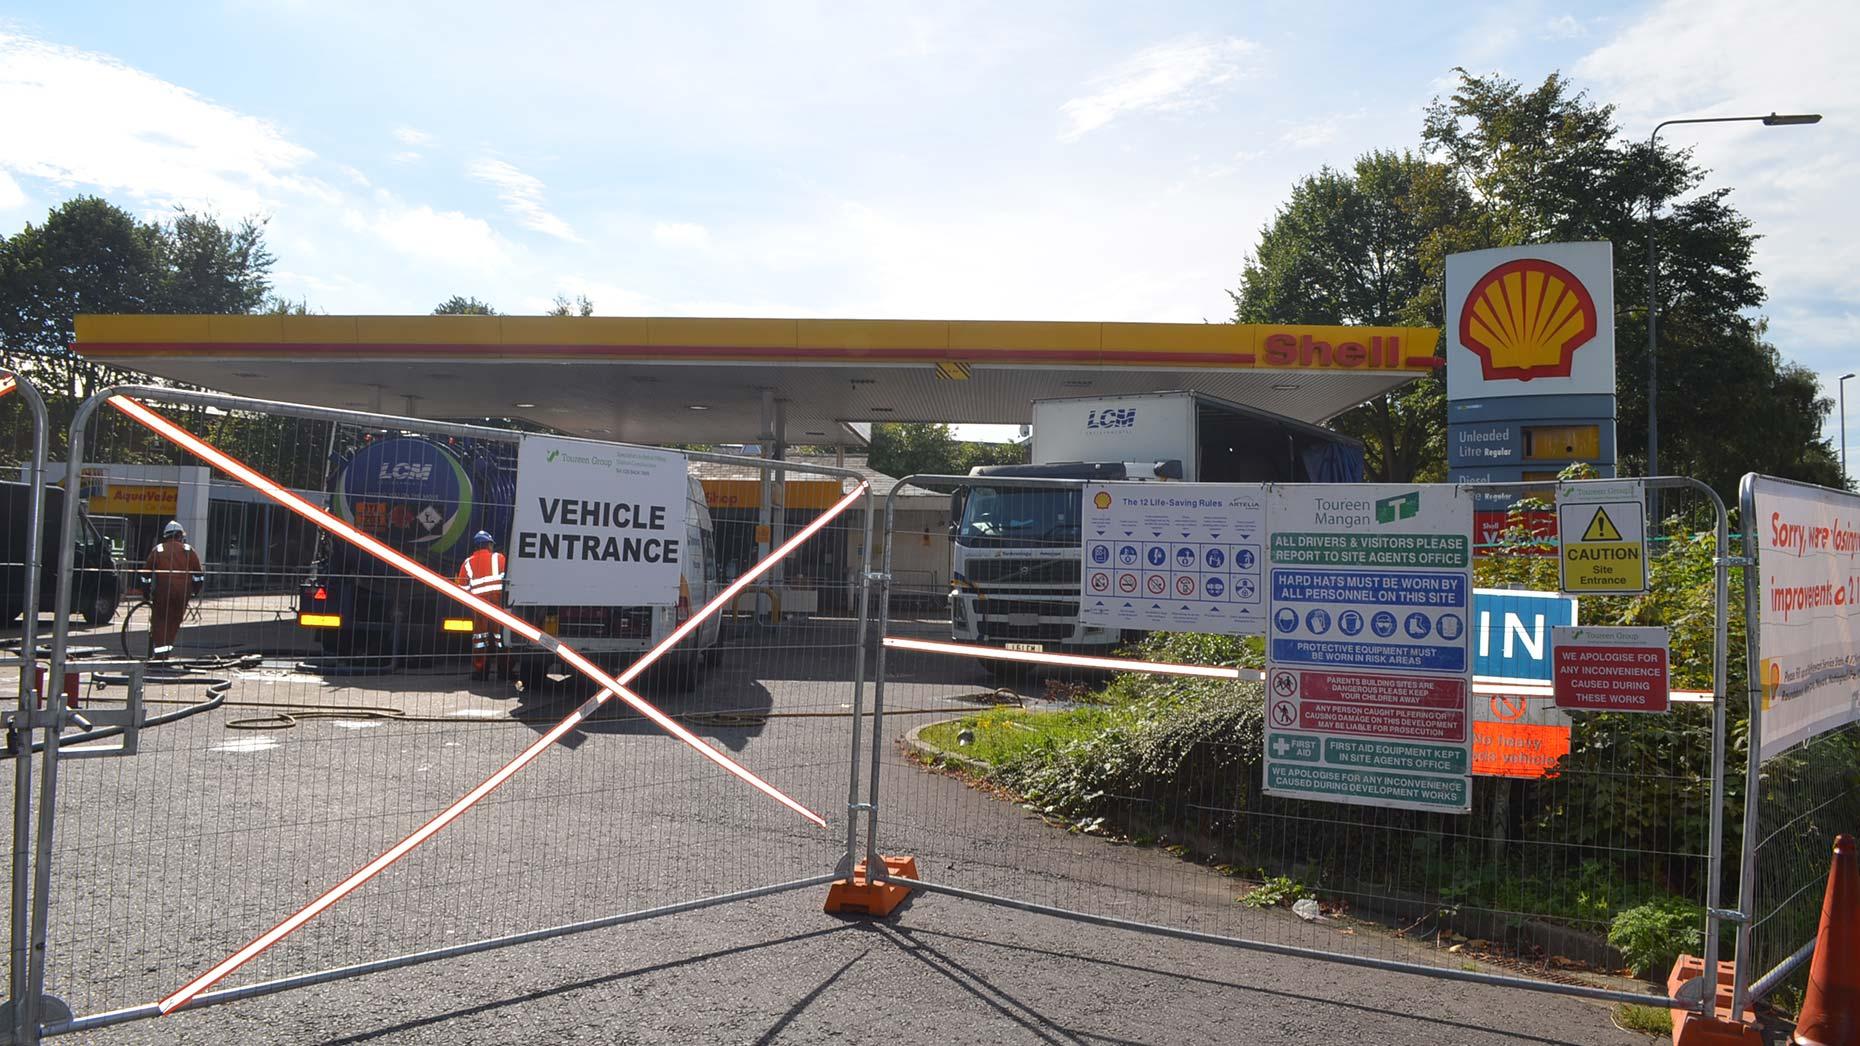 Burton road shell garage closed for maintenance - Find nearest shell garage ...